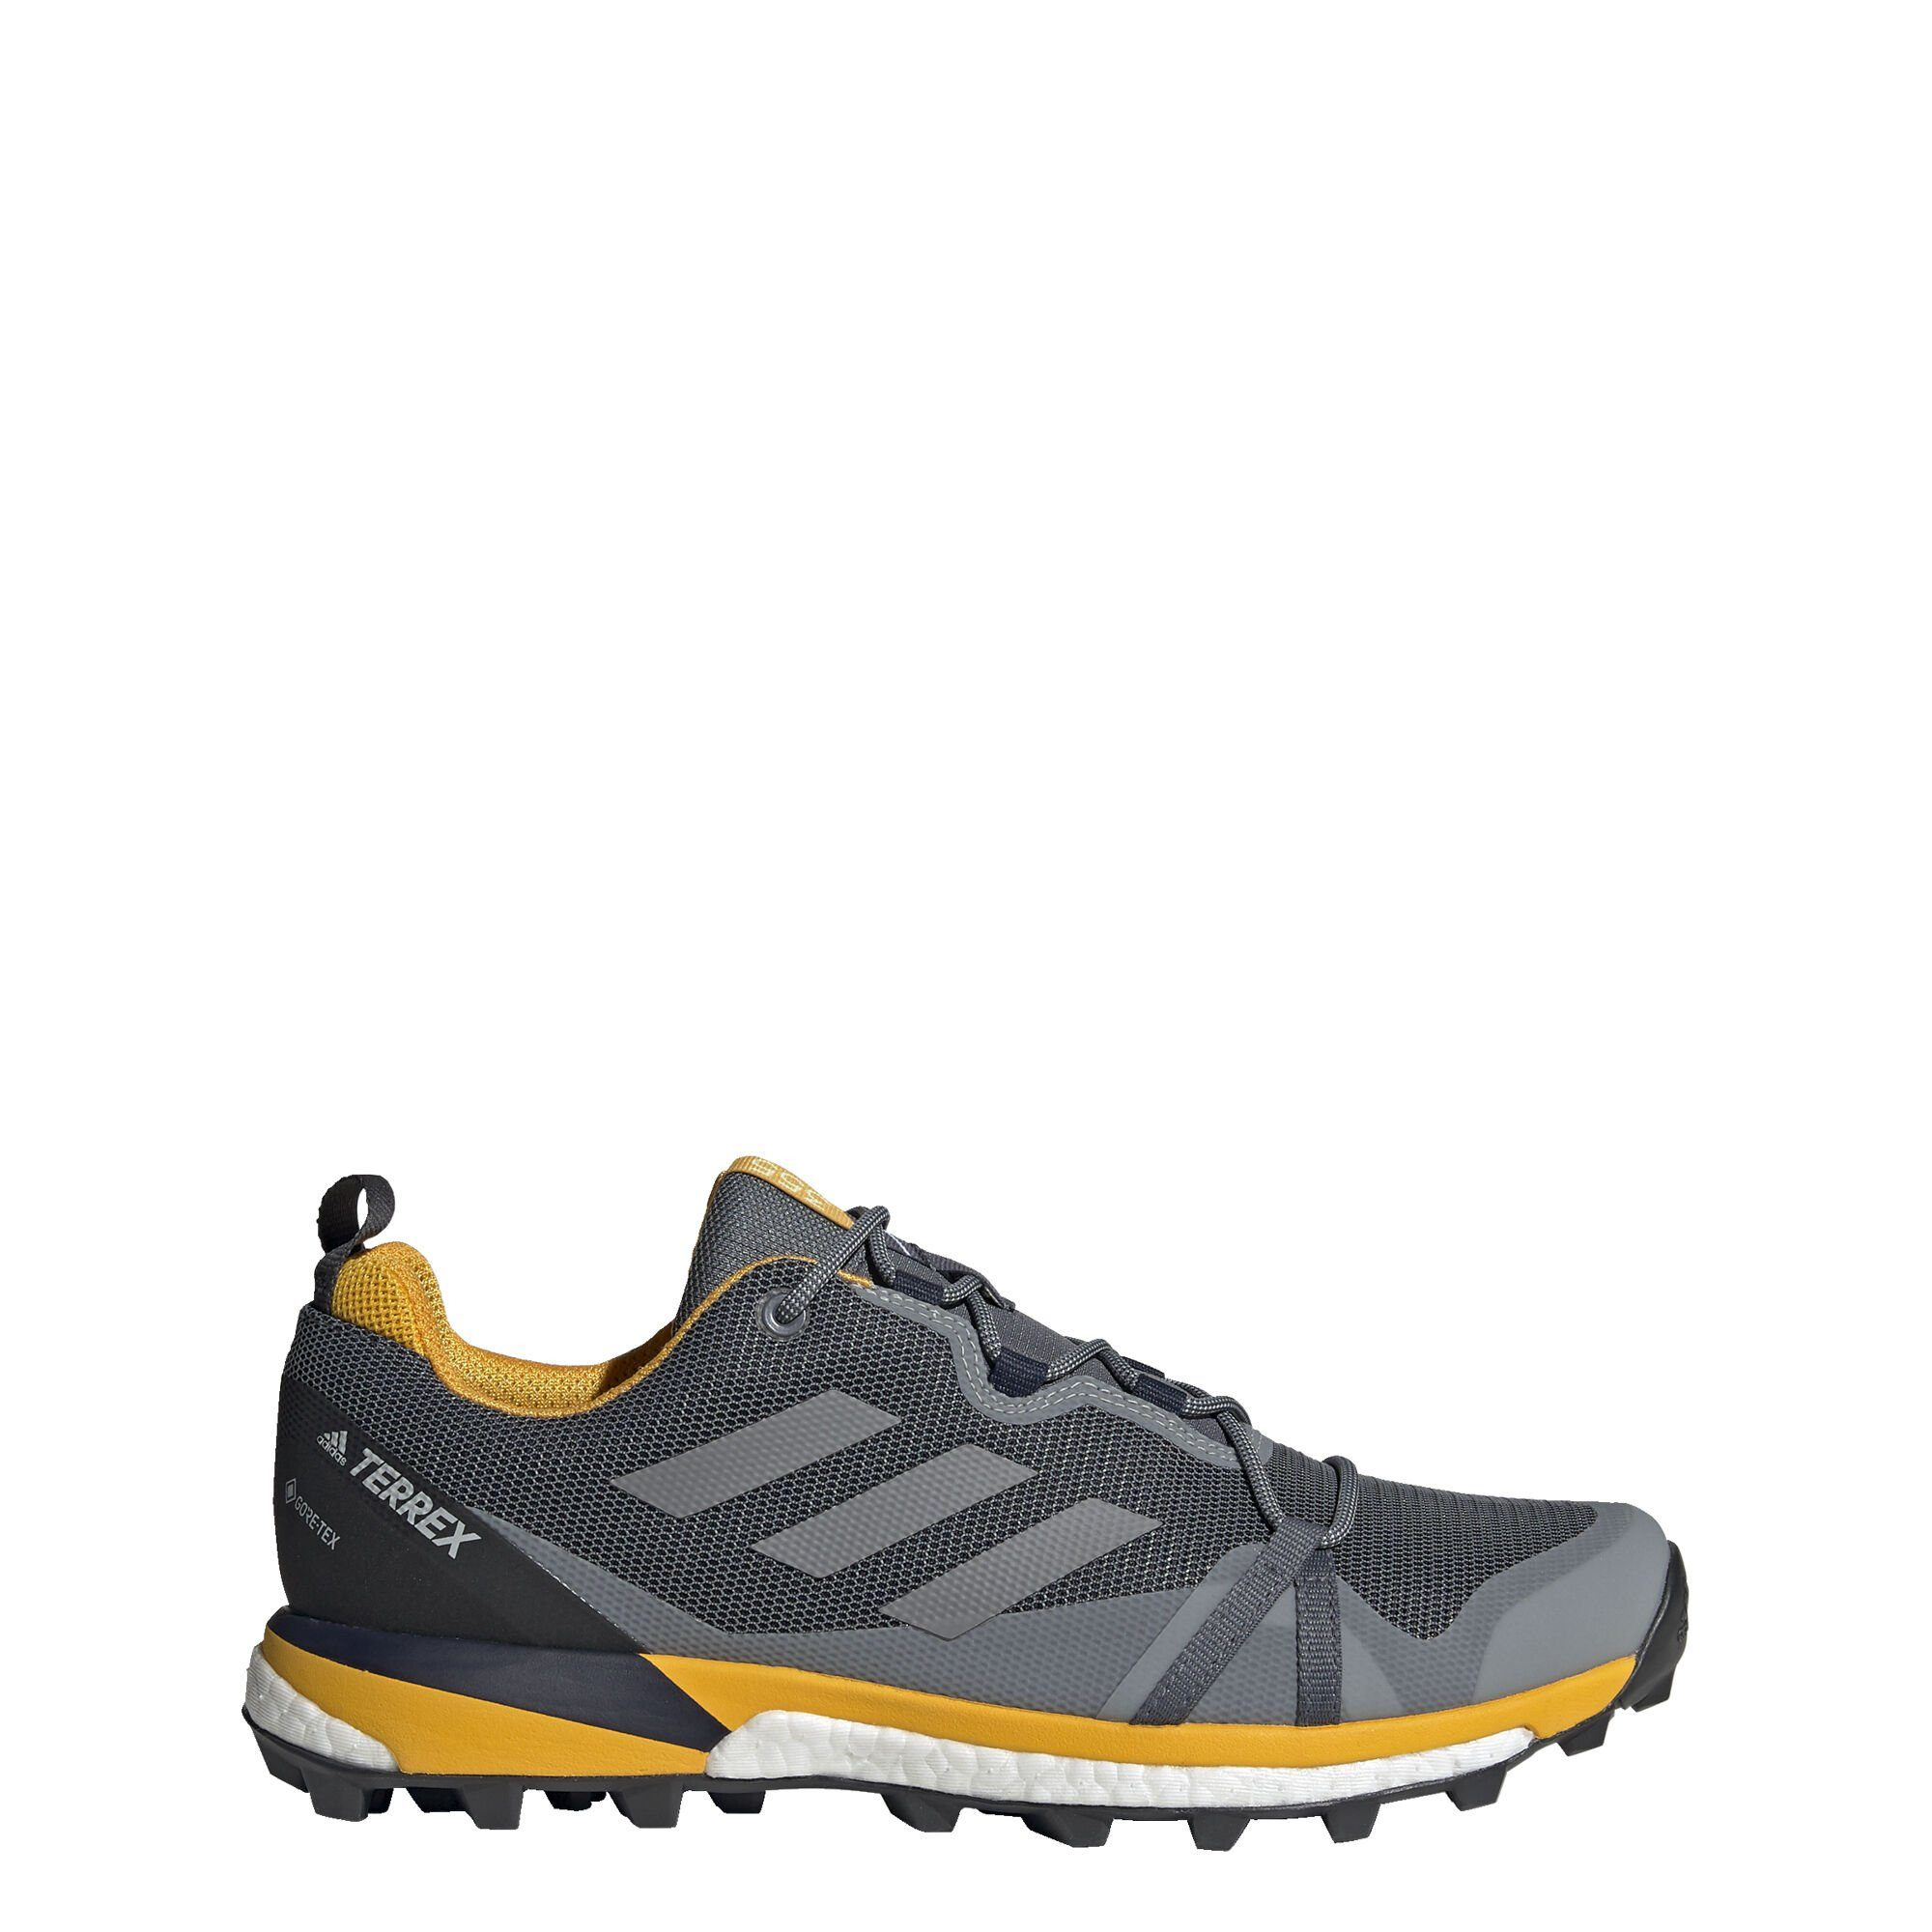 adidas Performance »TERREX Skychaser LT GTX Schuh« Outdoorschuh Outdoorschuh online kaufen | OTTO